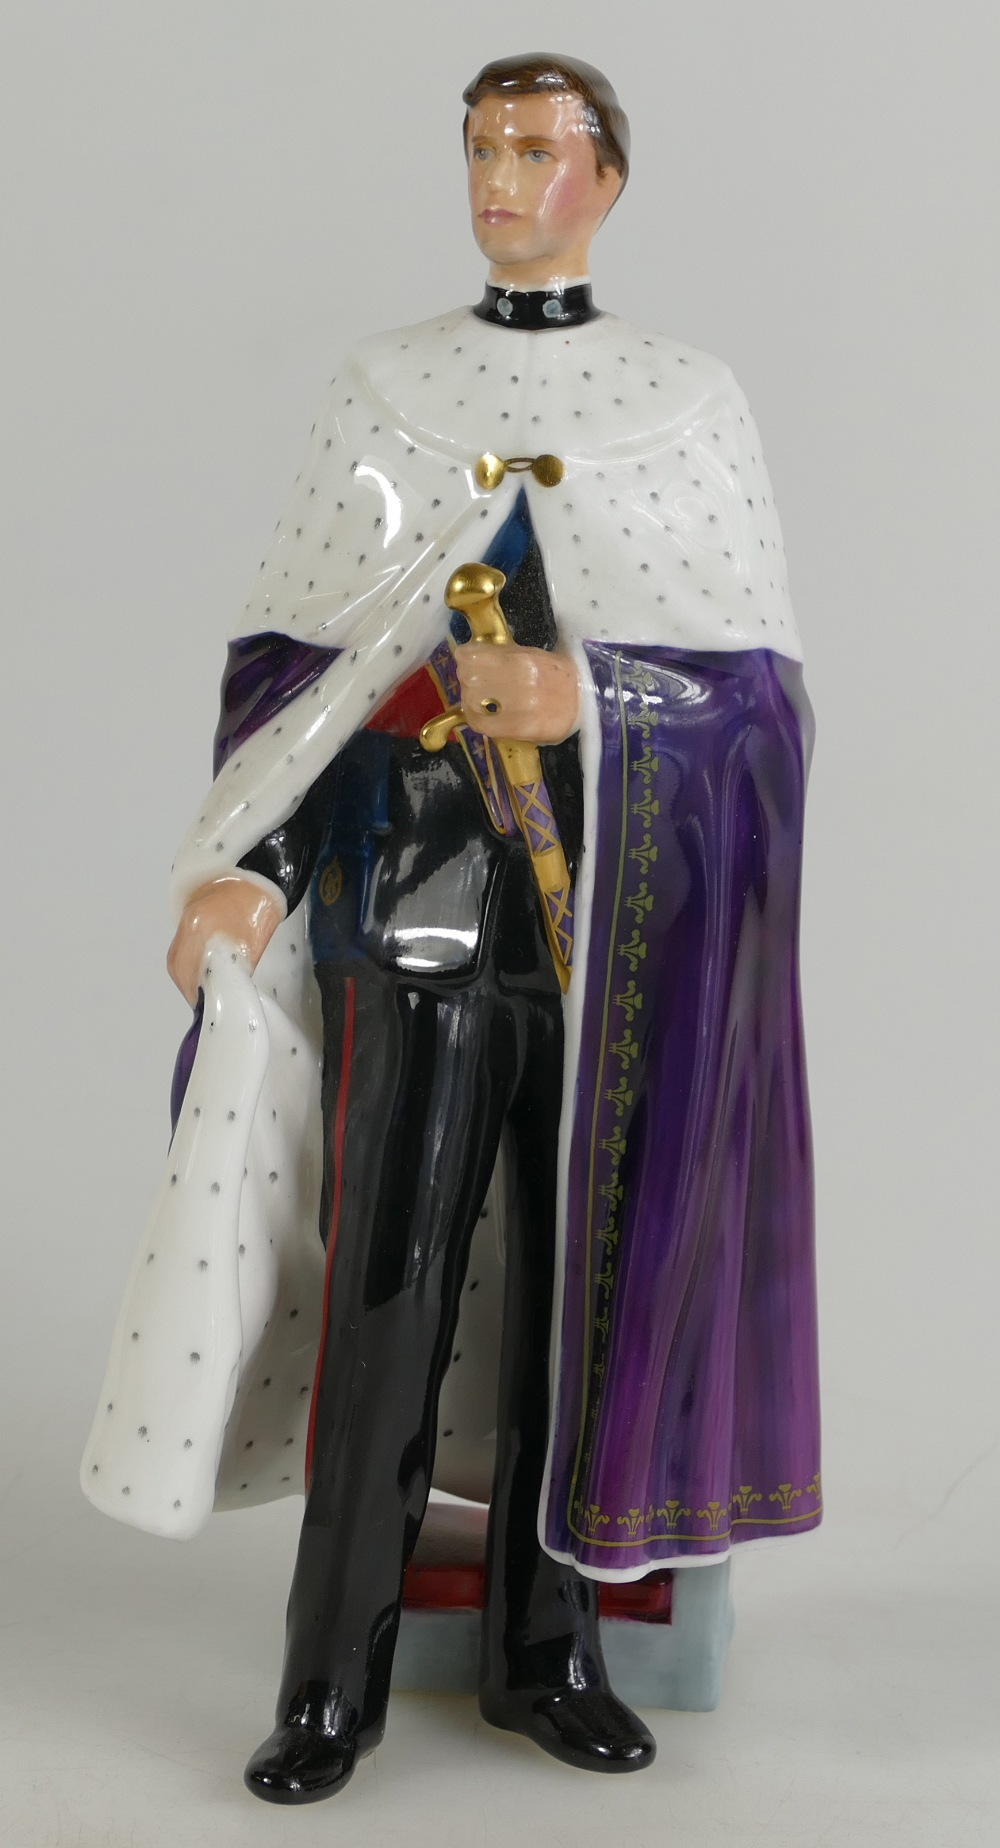 Lot 190 - Royal Doulton prestige figure HRH The Pr